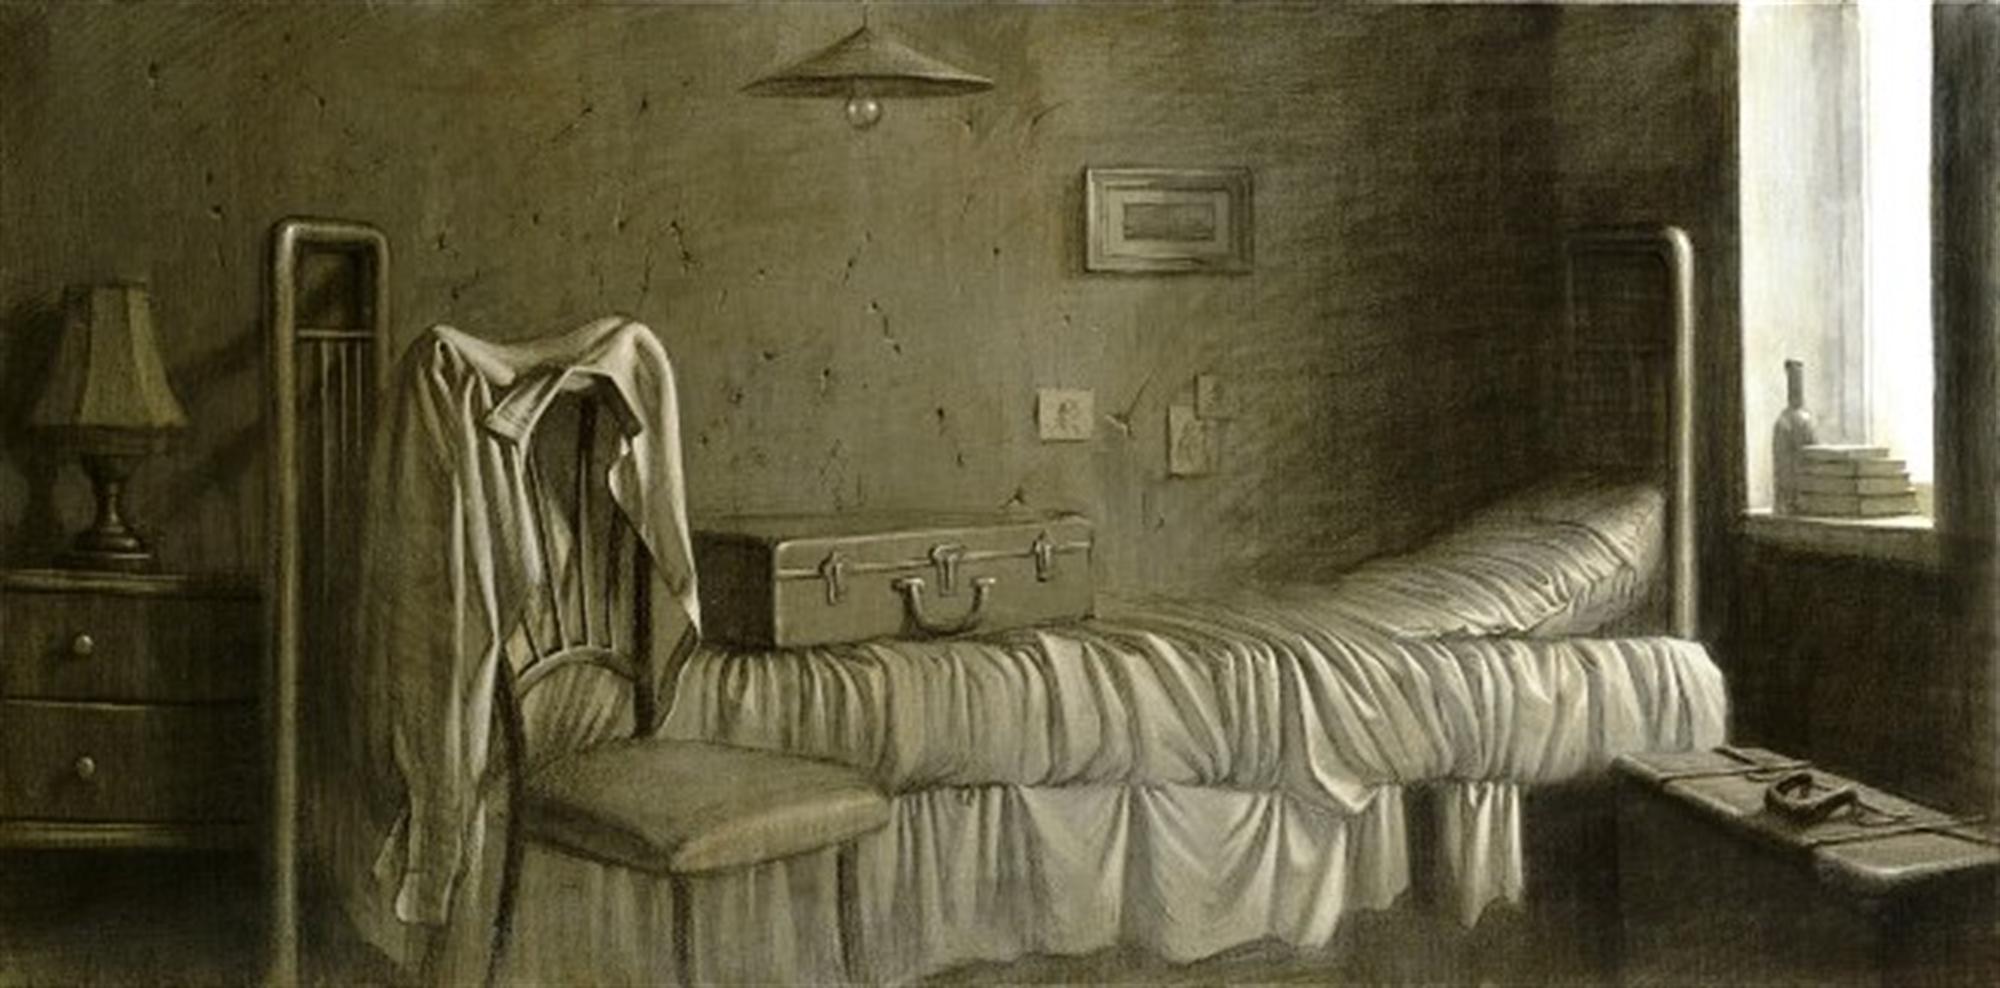 A Restless Night by Alexei Butirskiy